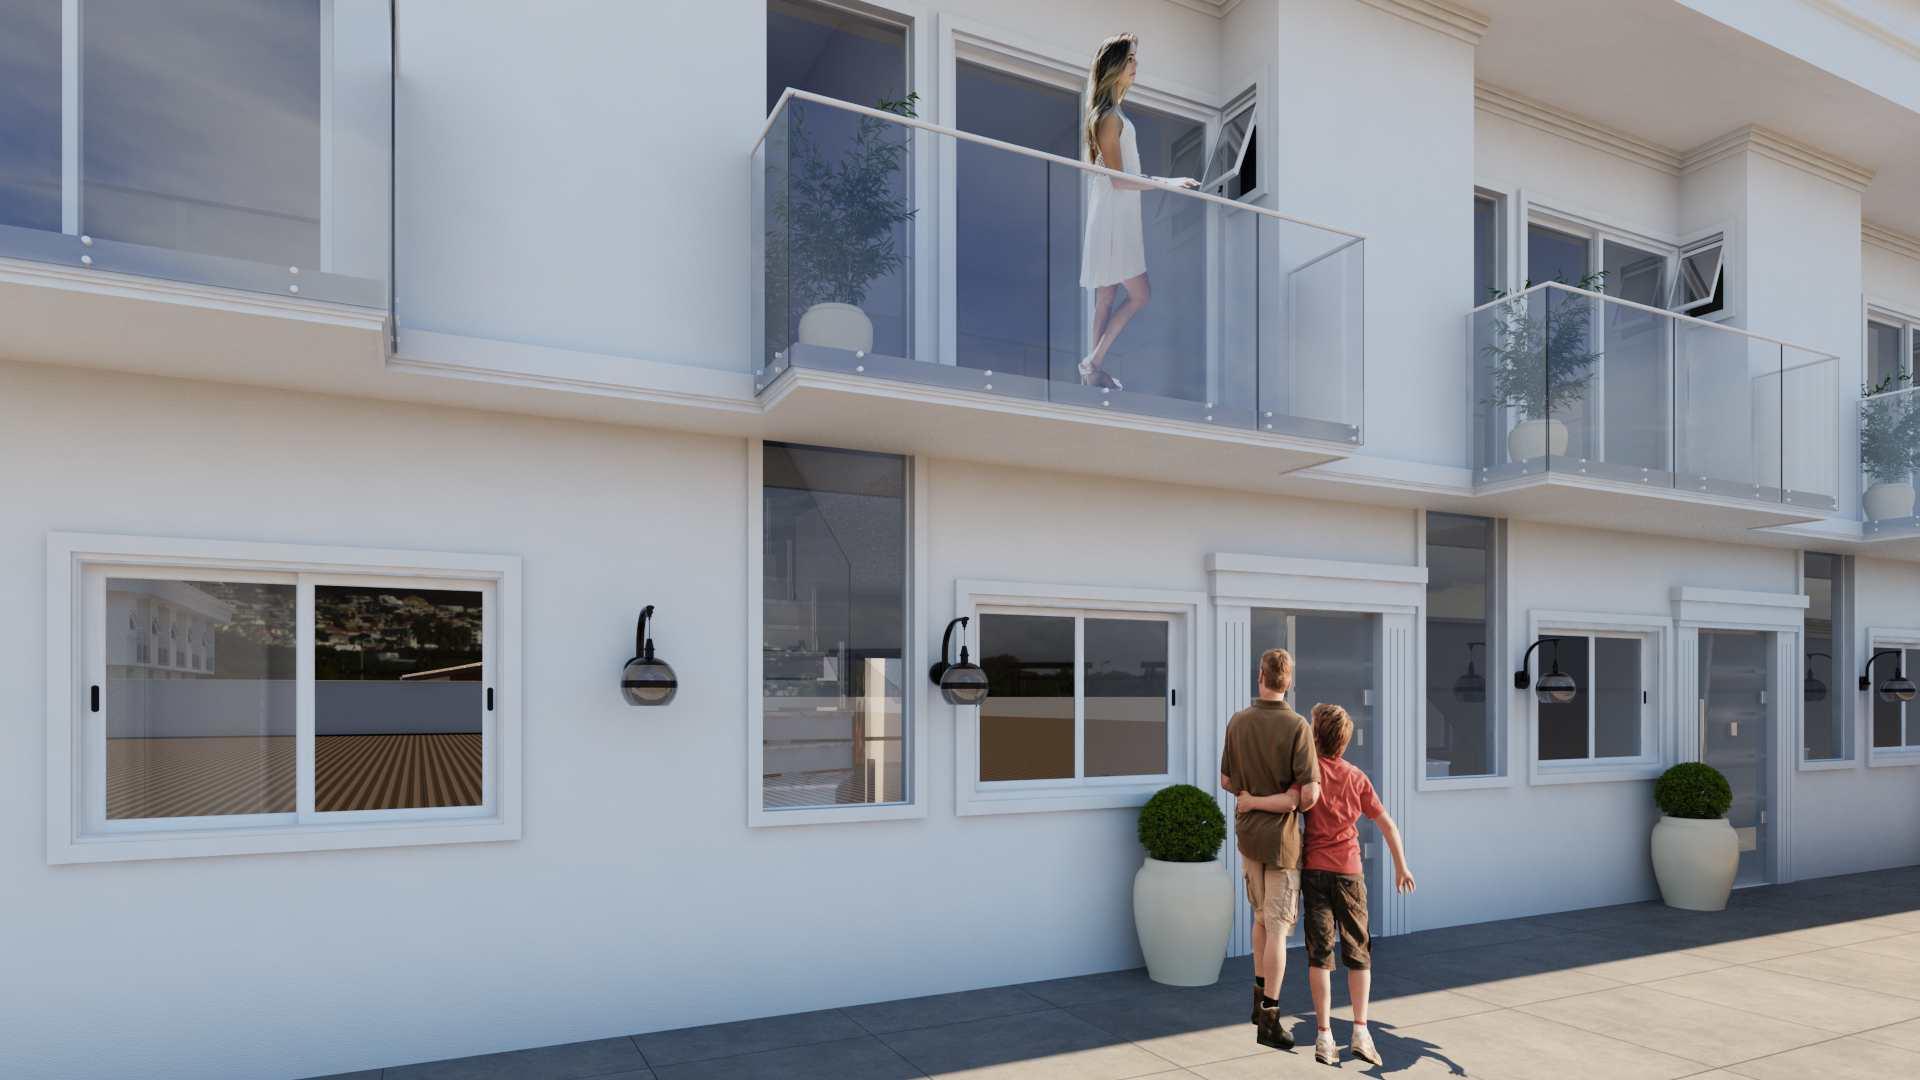 Casa de Condomínio com 2 dorms, Cibratel II, Itanhaém - R$ 275 mil, Cod: 5394